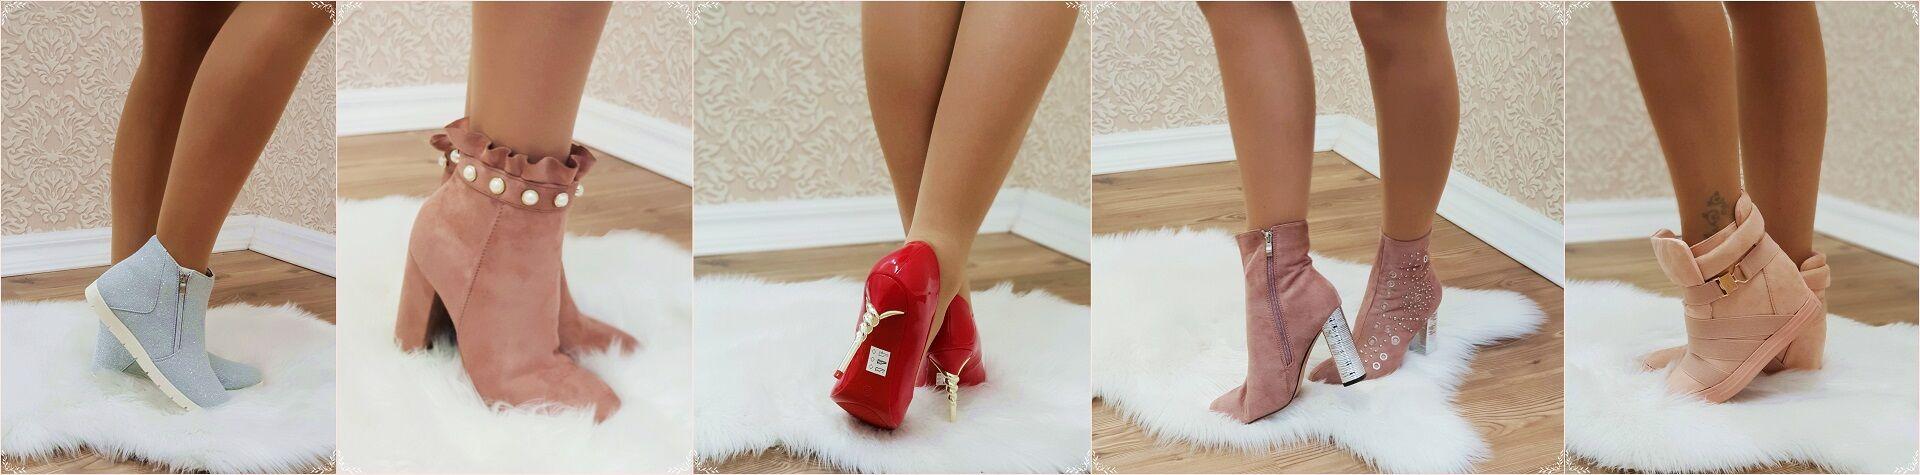 Luna Gardrobe Női ruha WebÁruház 2b6de8ab0b